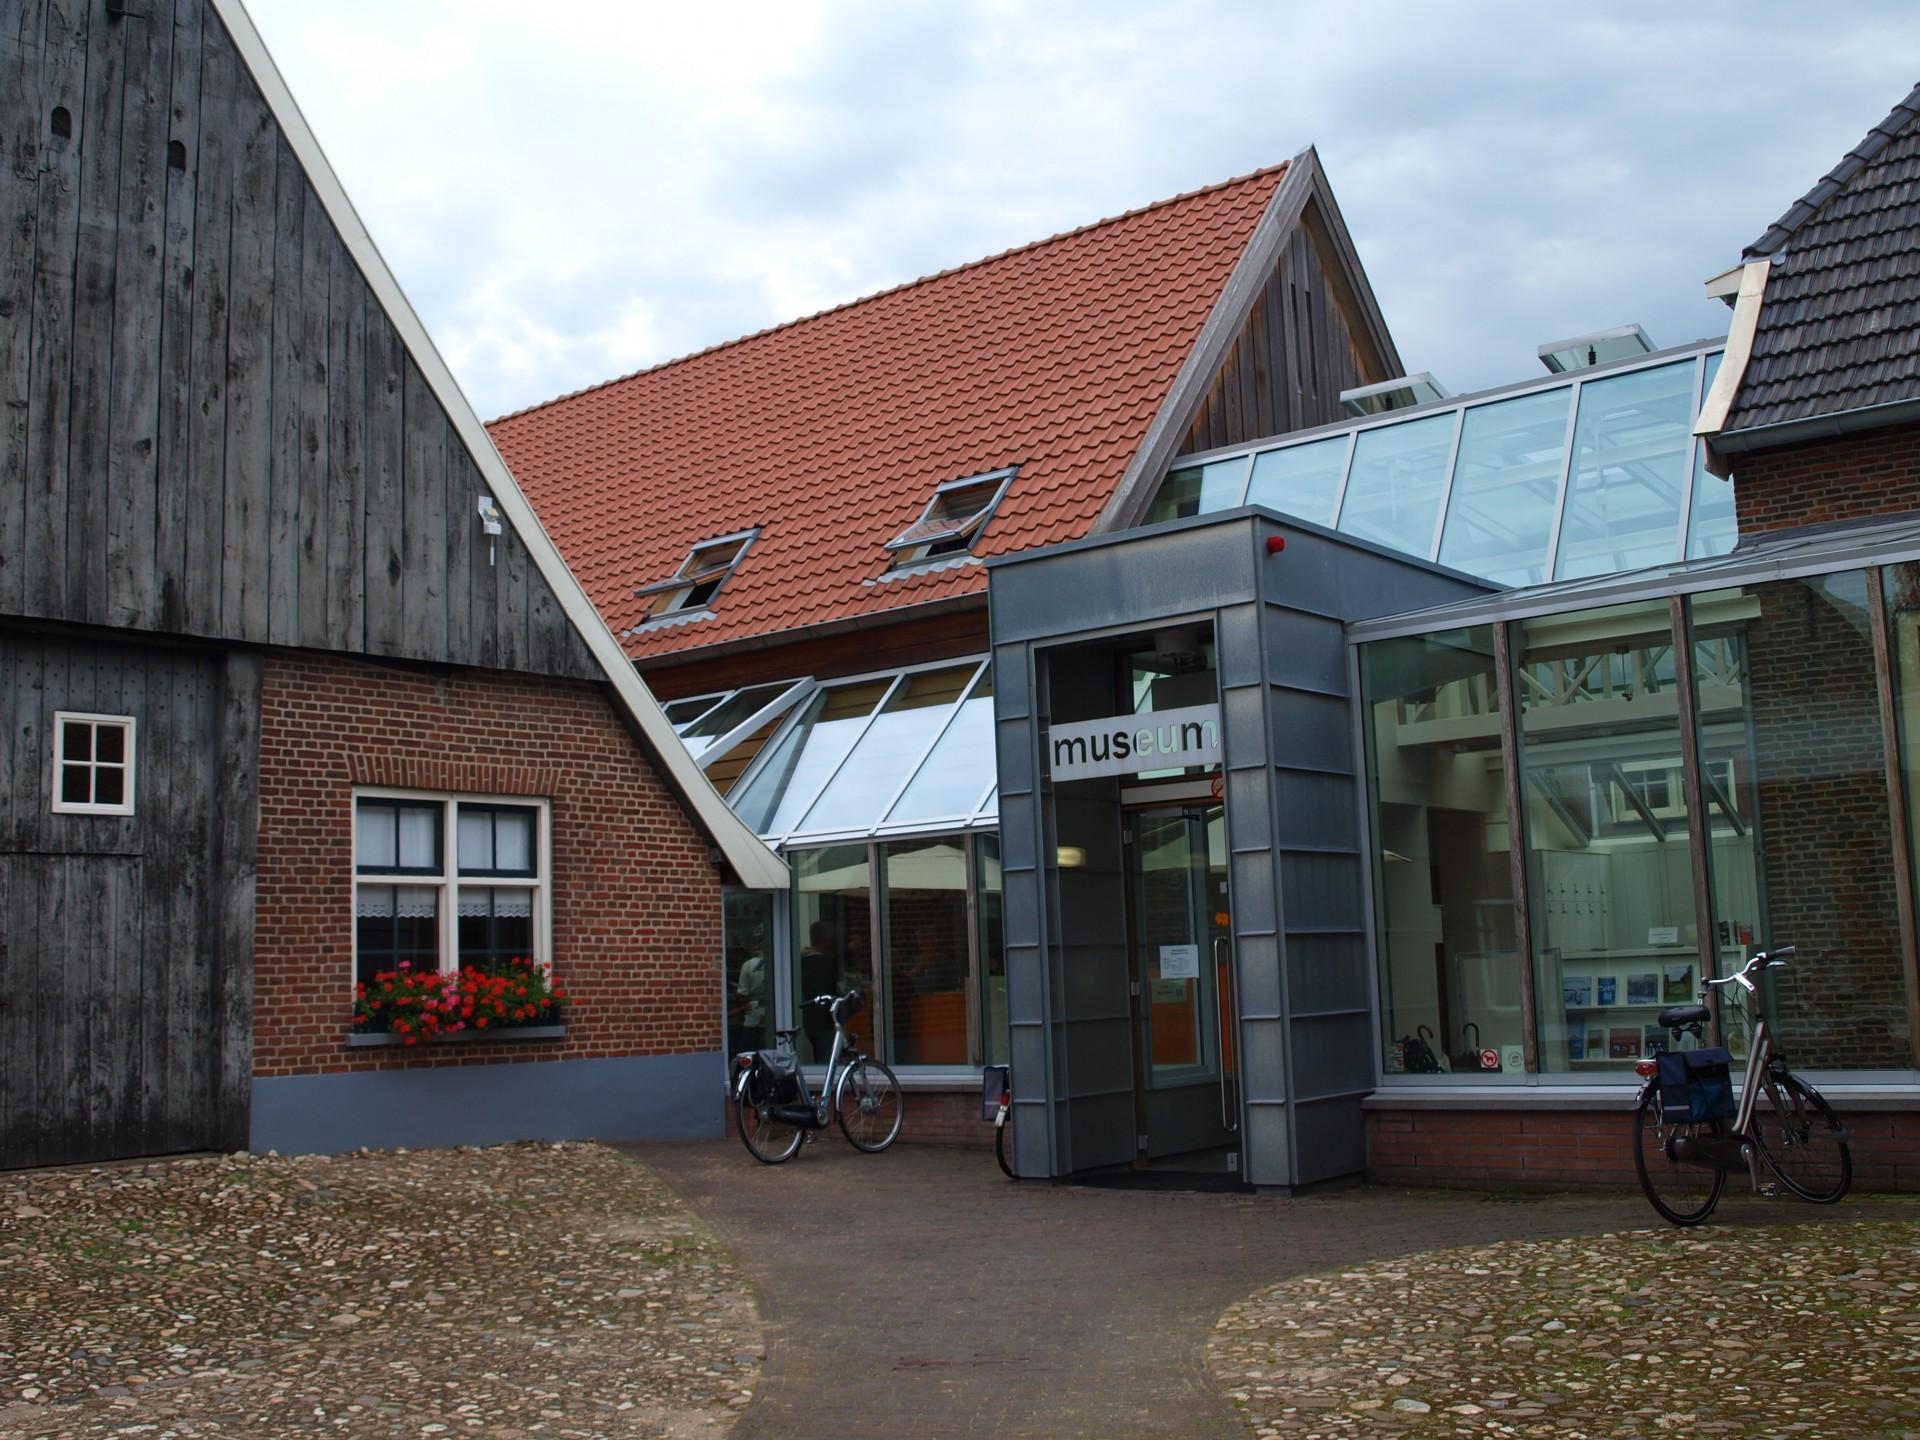 entree Aaltense Musea 2 e1415026489536